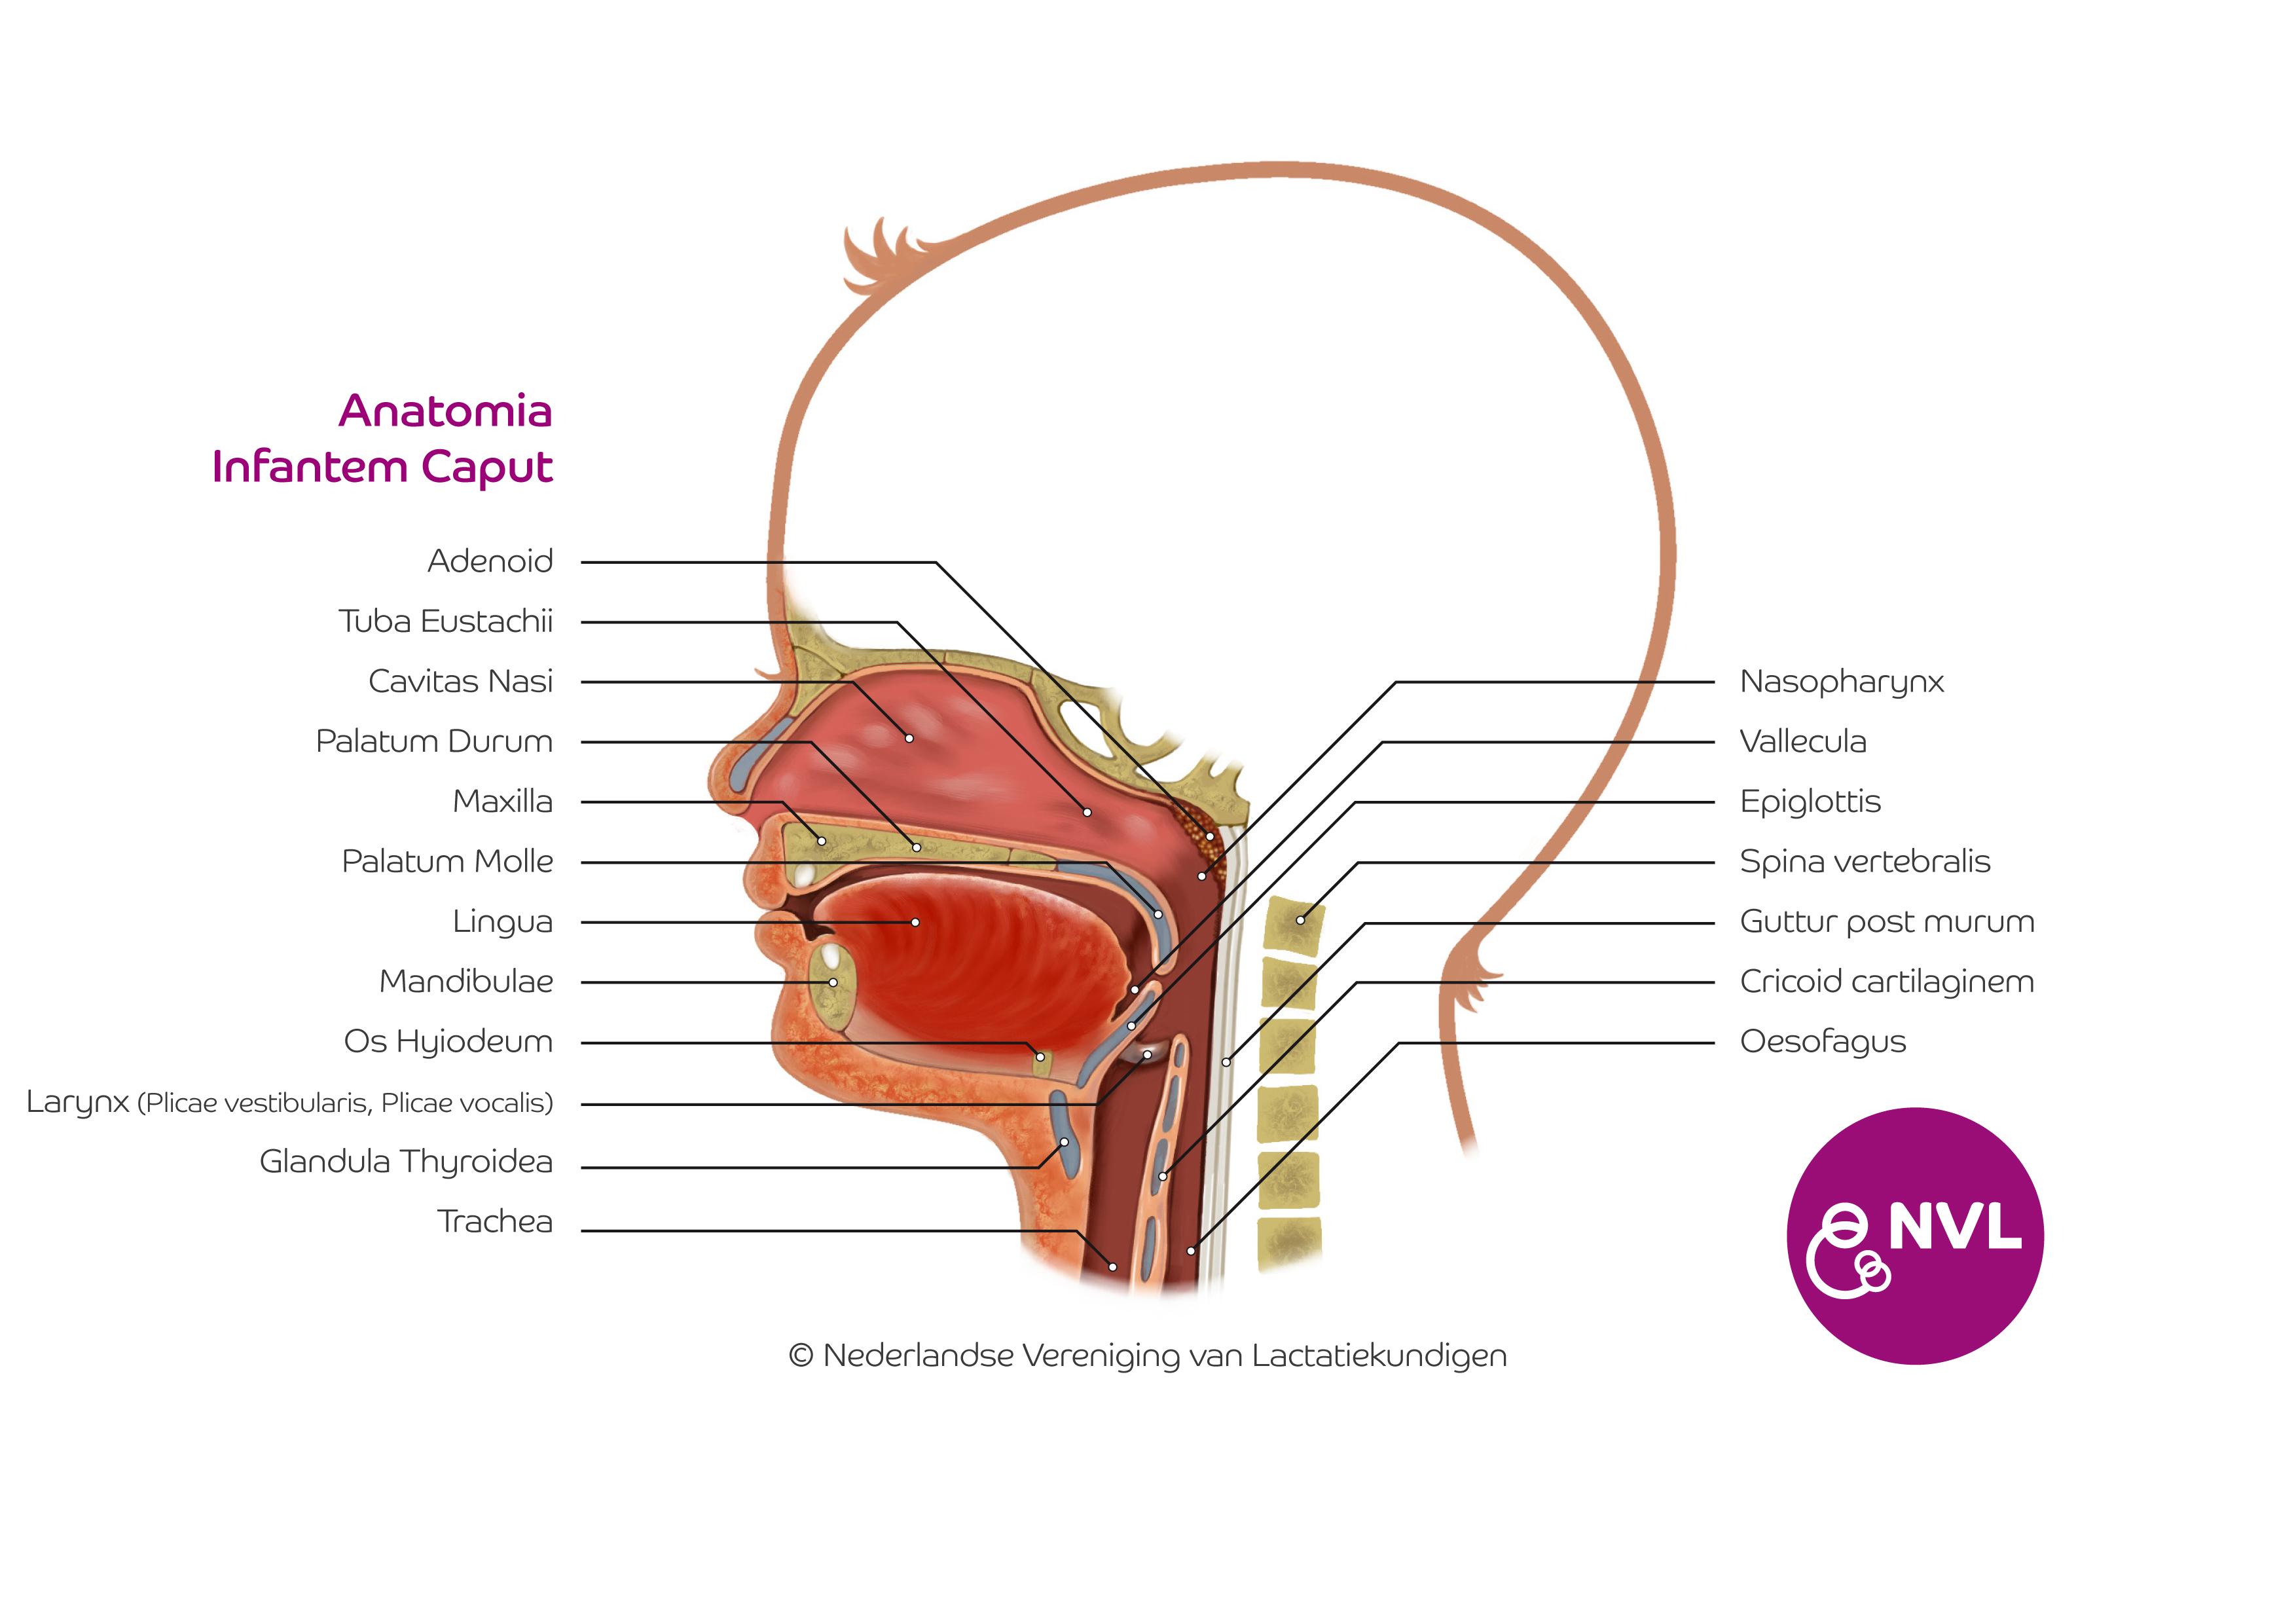 Anatomia Infantem Caput | NVL